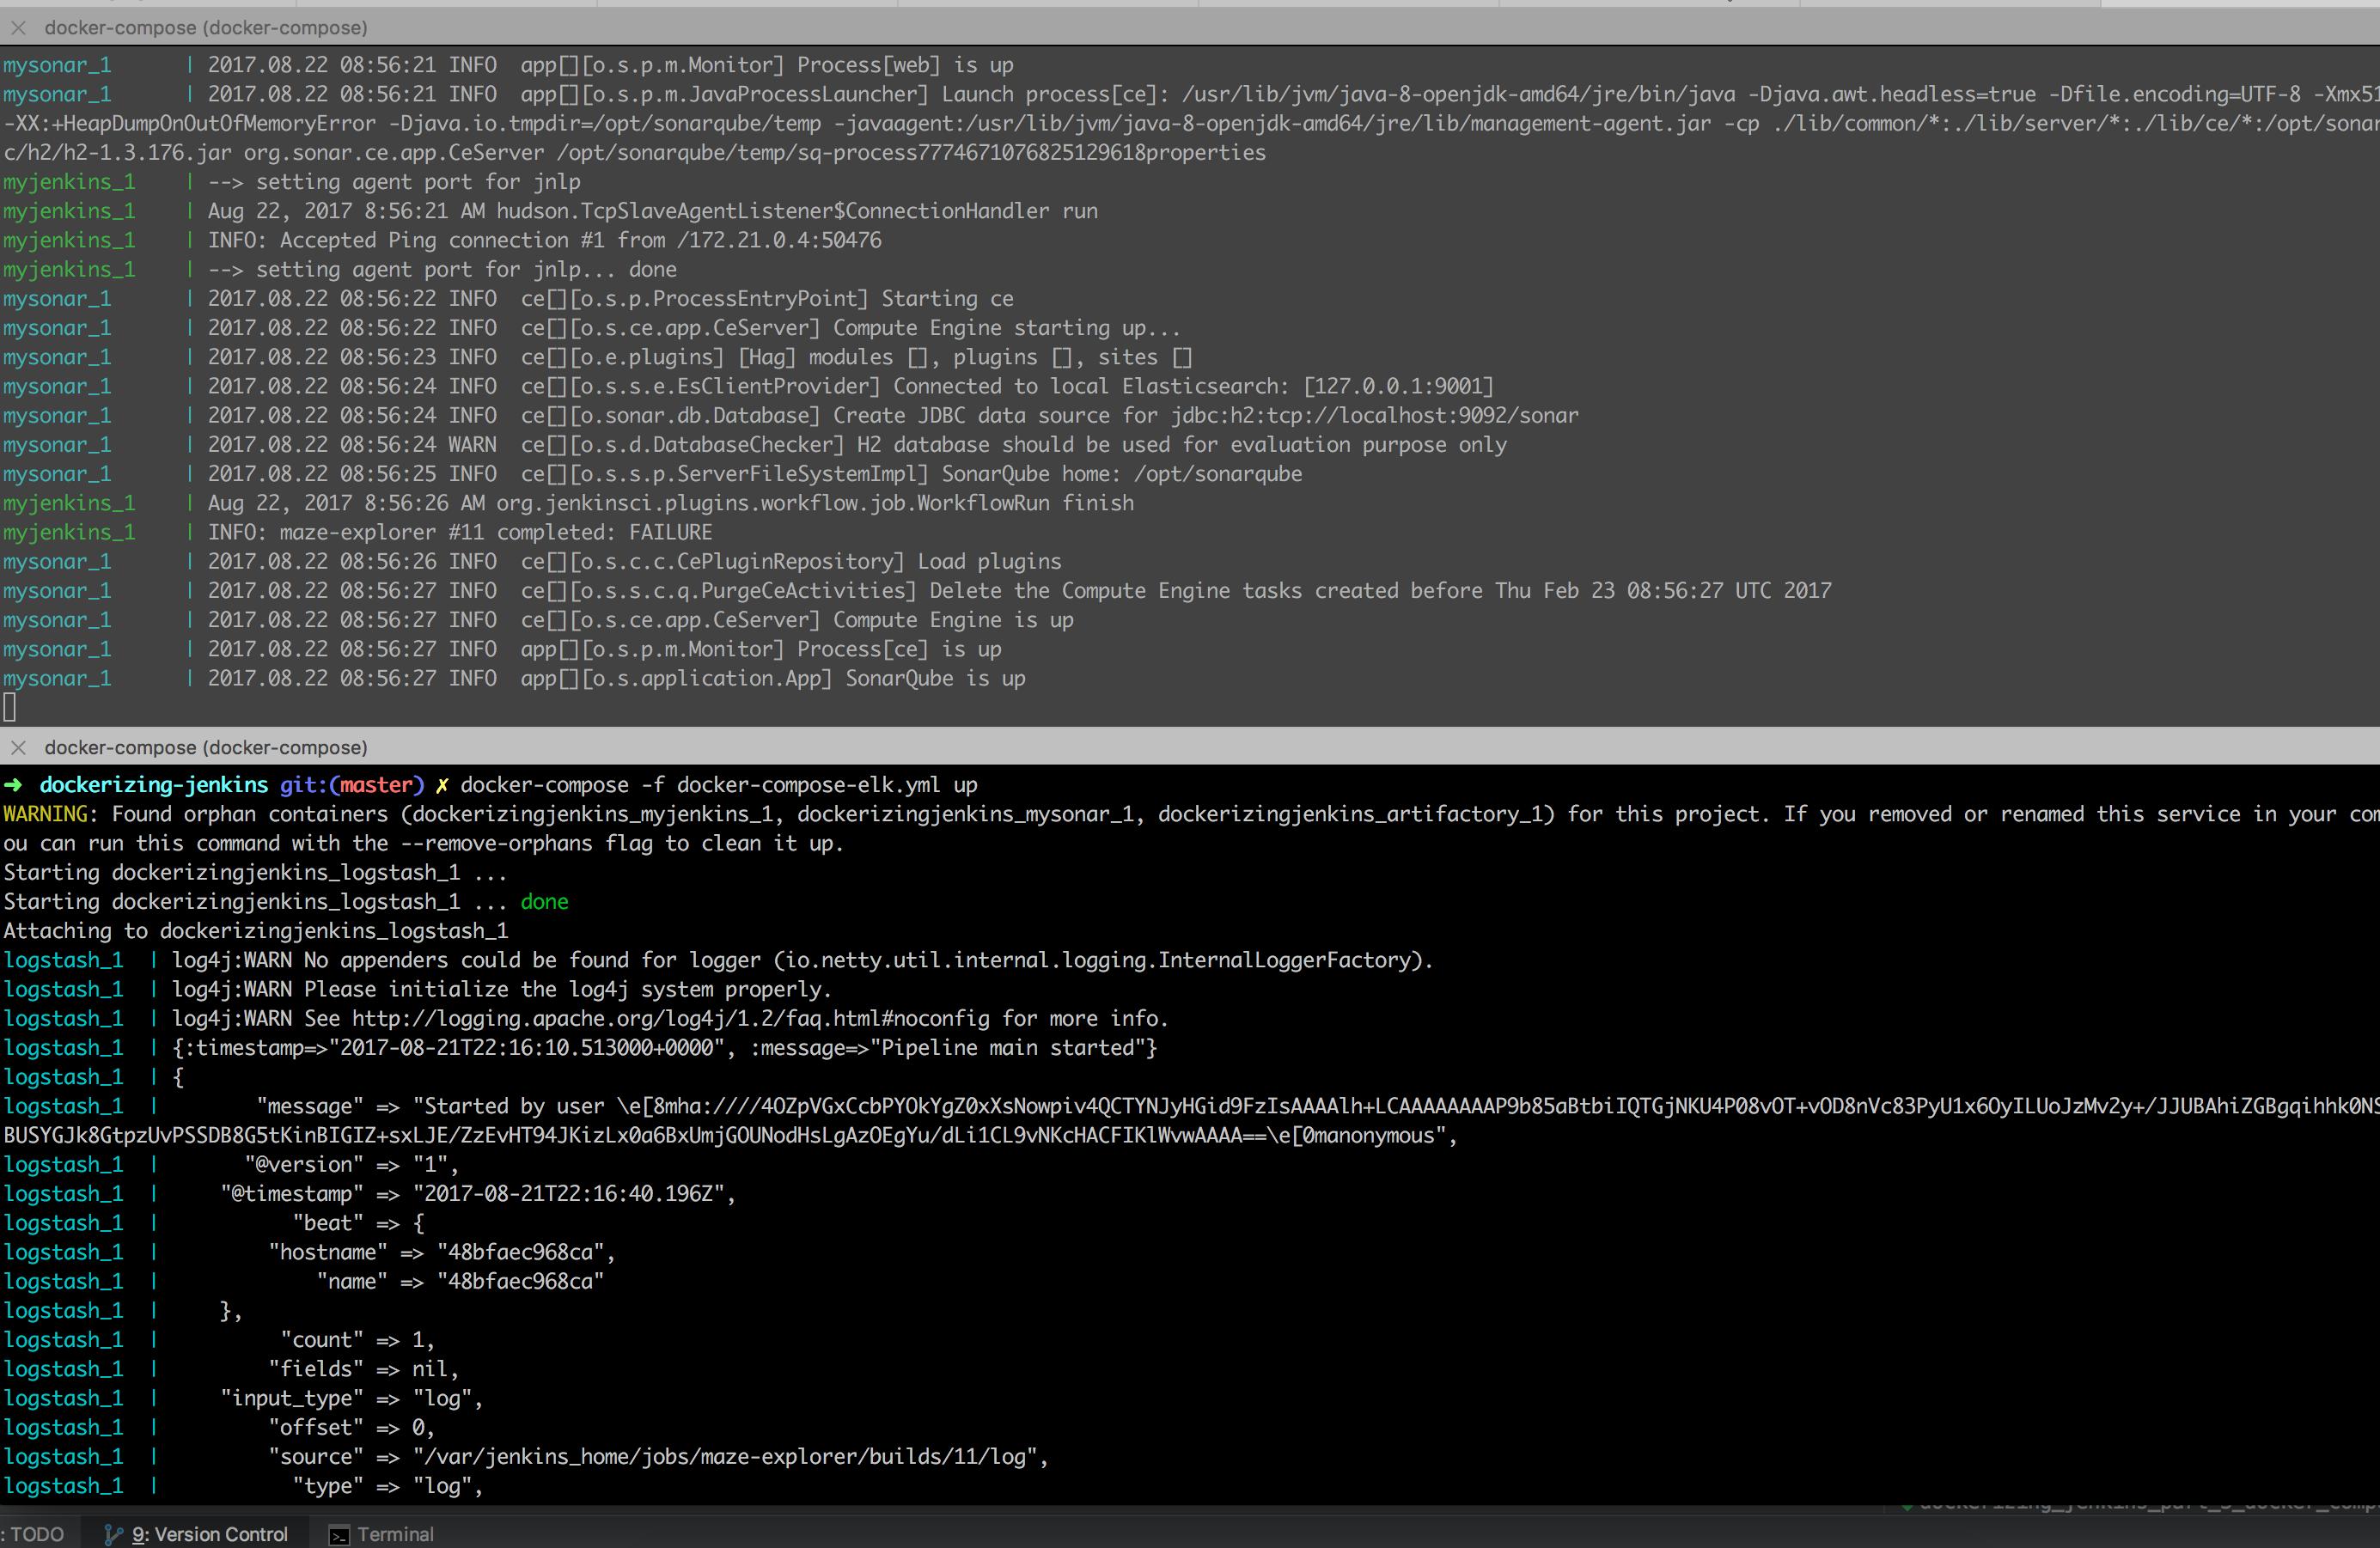 Dockerizing Jenkins build logs with ELK stack (Filebeat